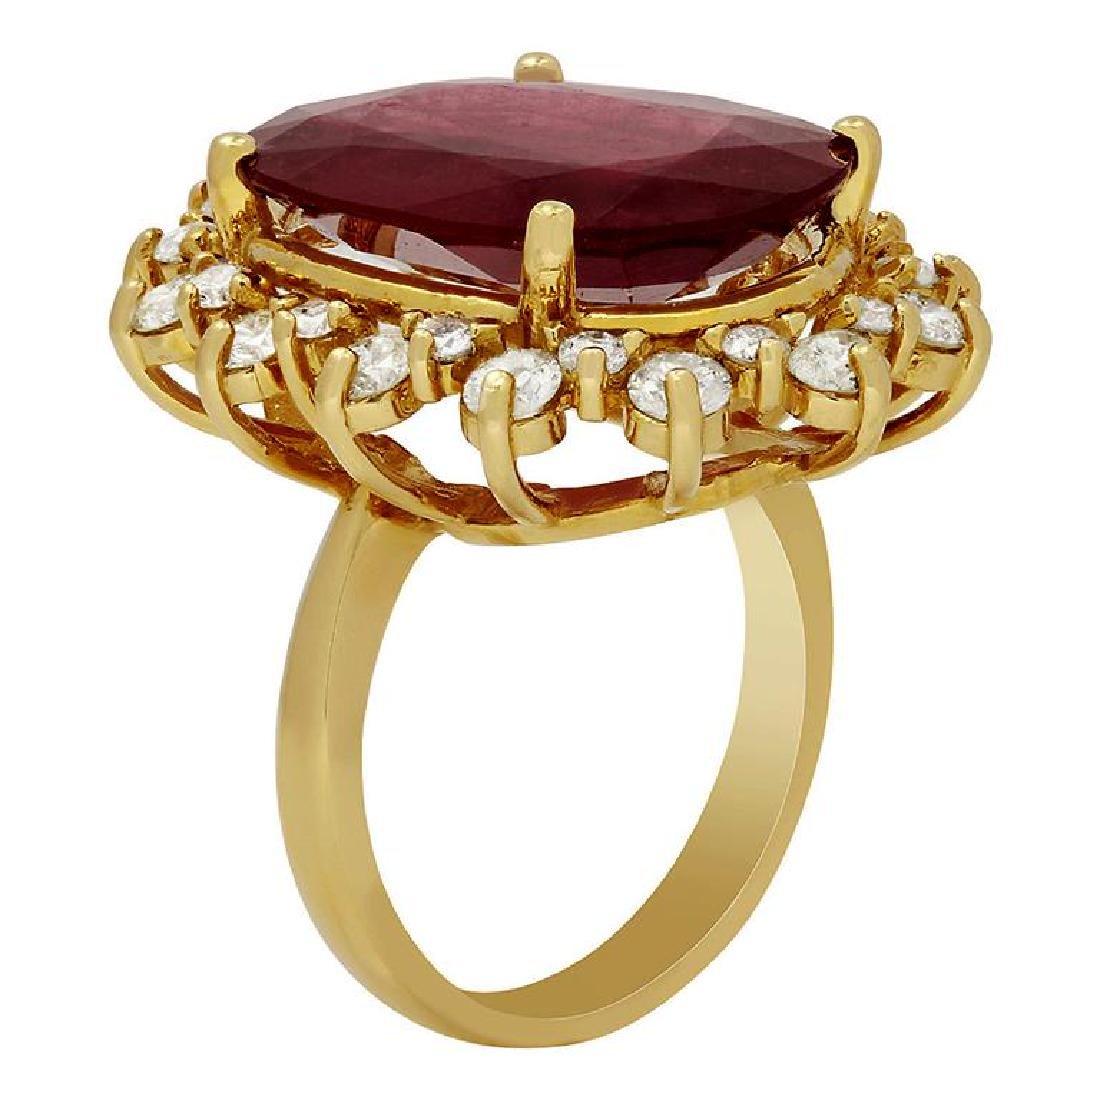 14k Yellow Gold 14.90ct Ruby 2.13ct Diamond Ring - 2